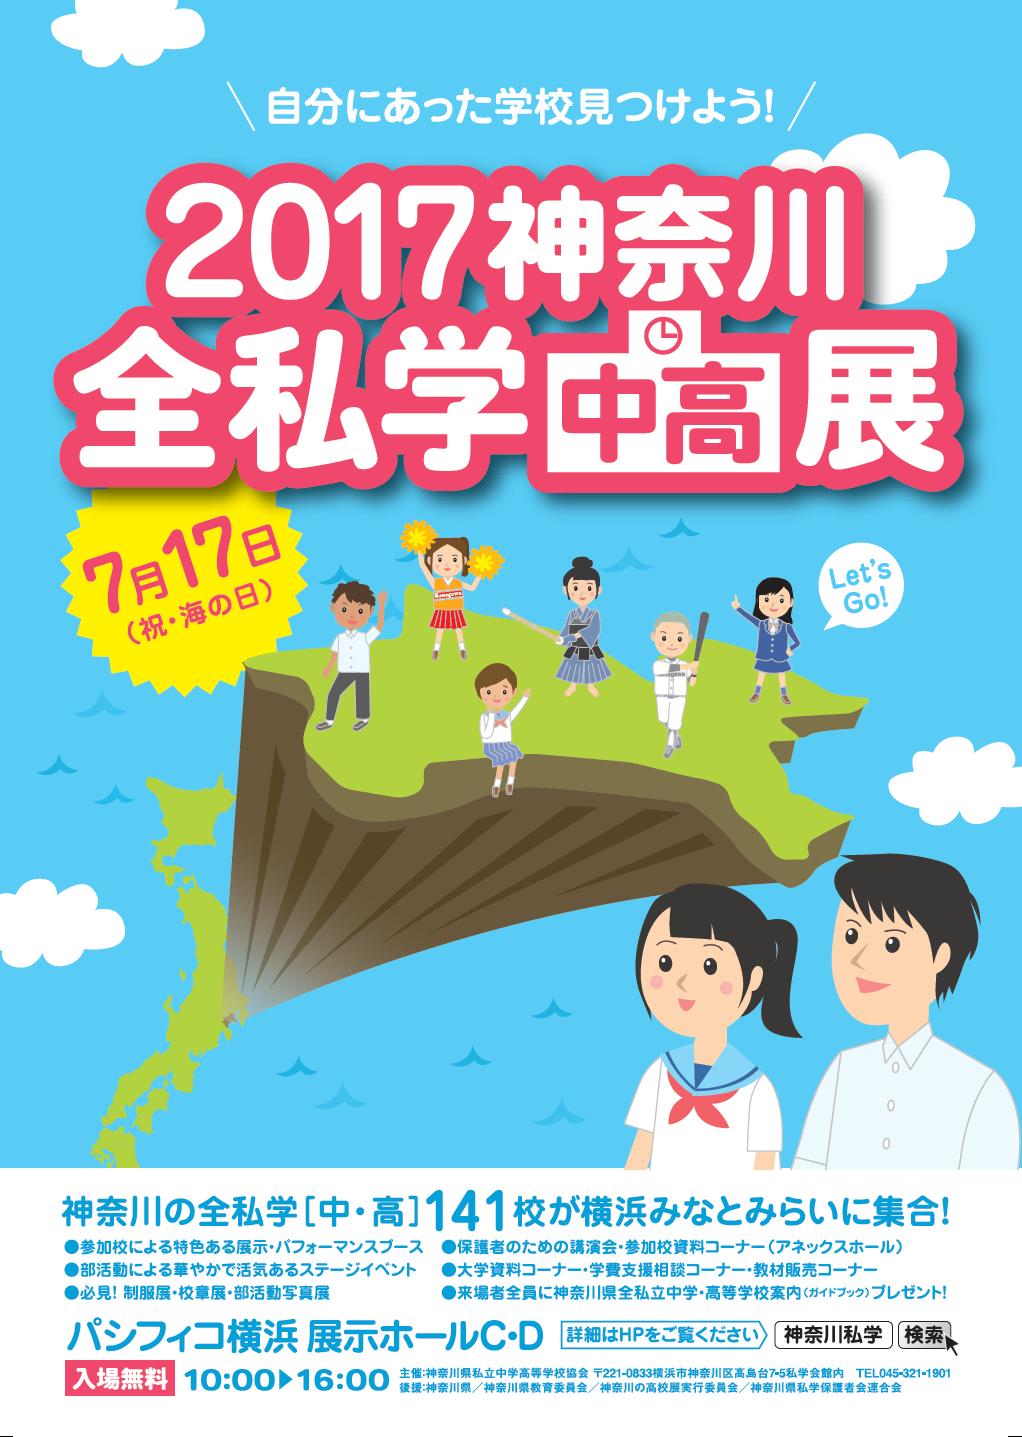 http://www.zushi-kaisei.ac.jp/news/96b64b1f6ec34a019df8941877f2223b32342b13.png